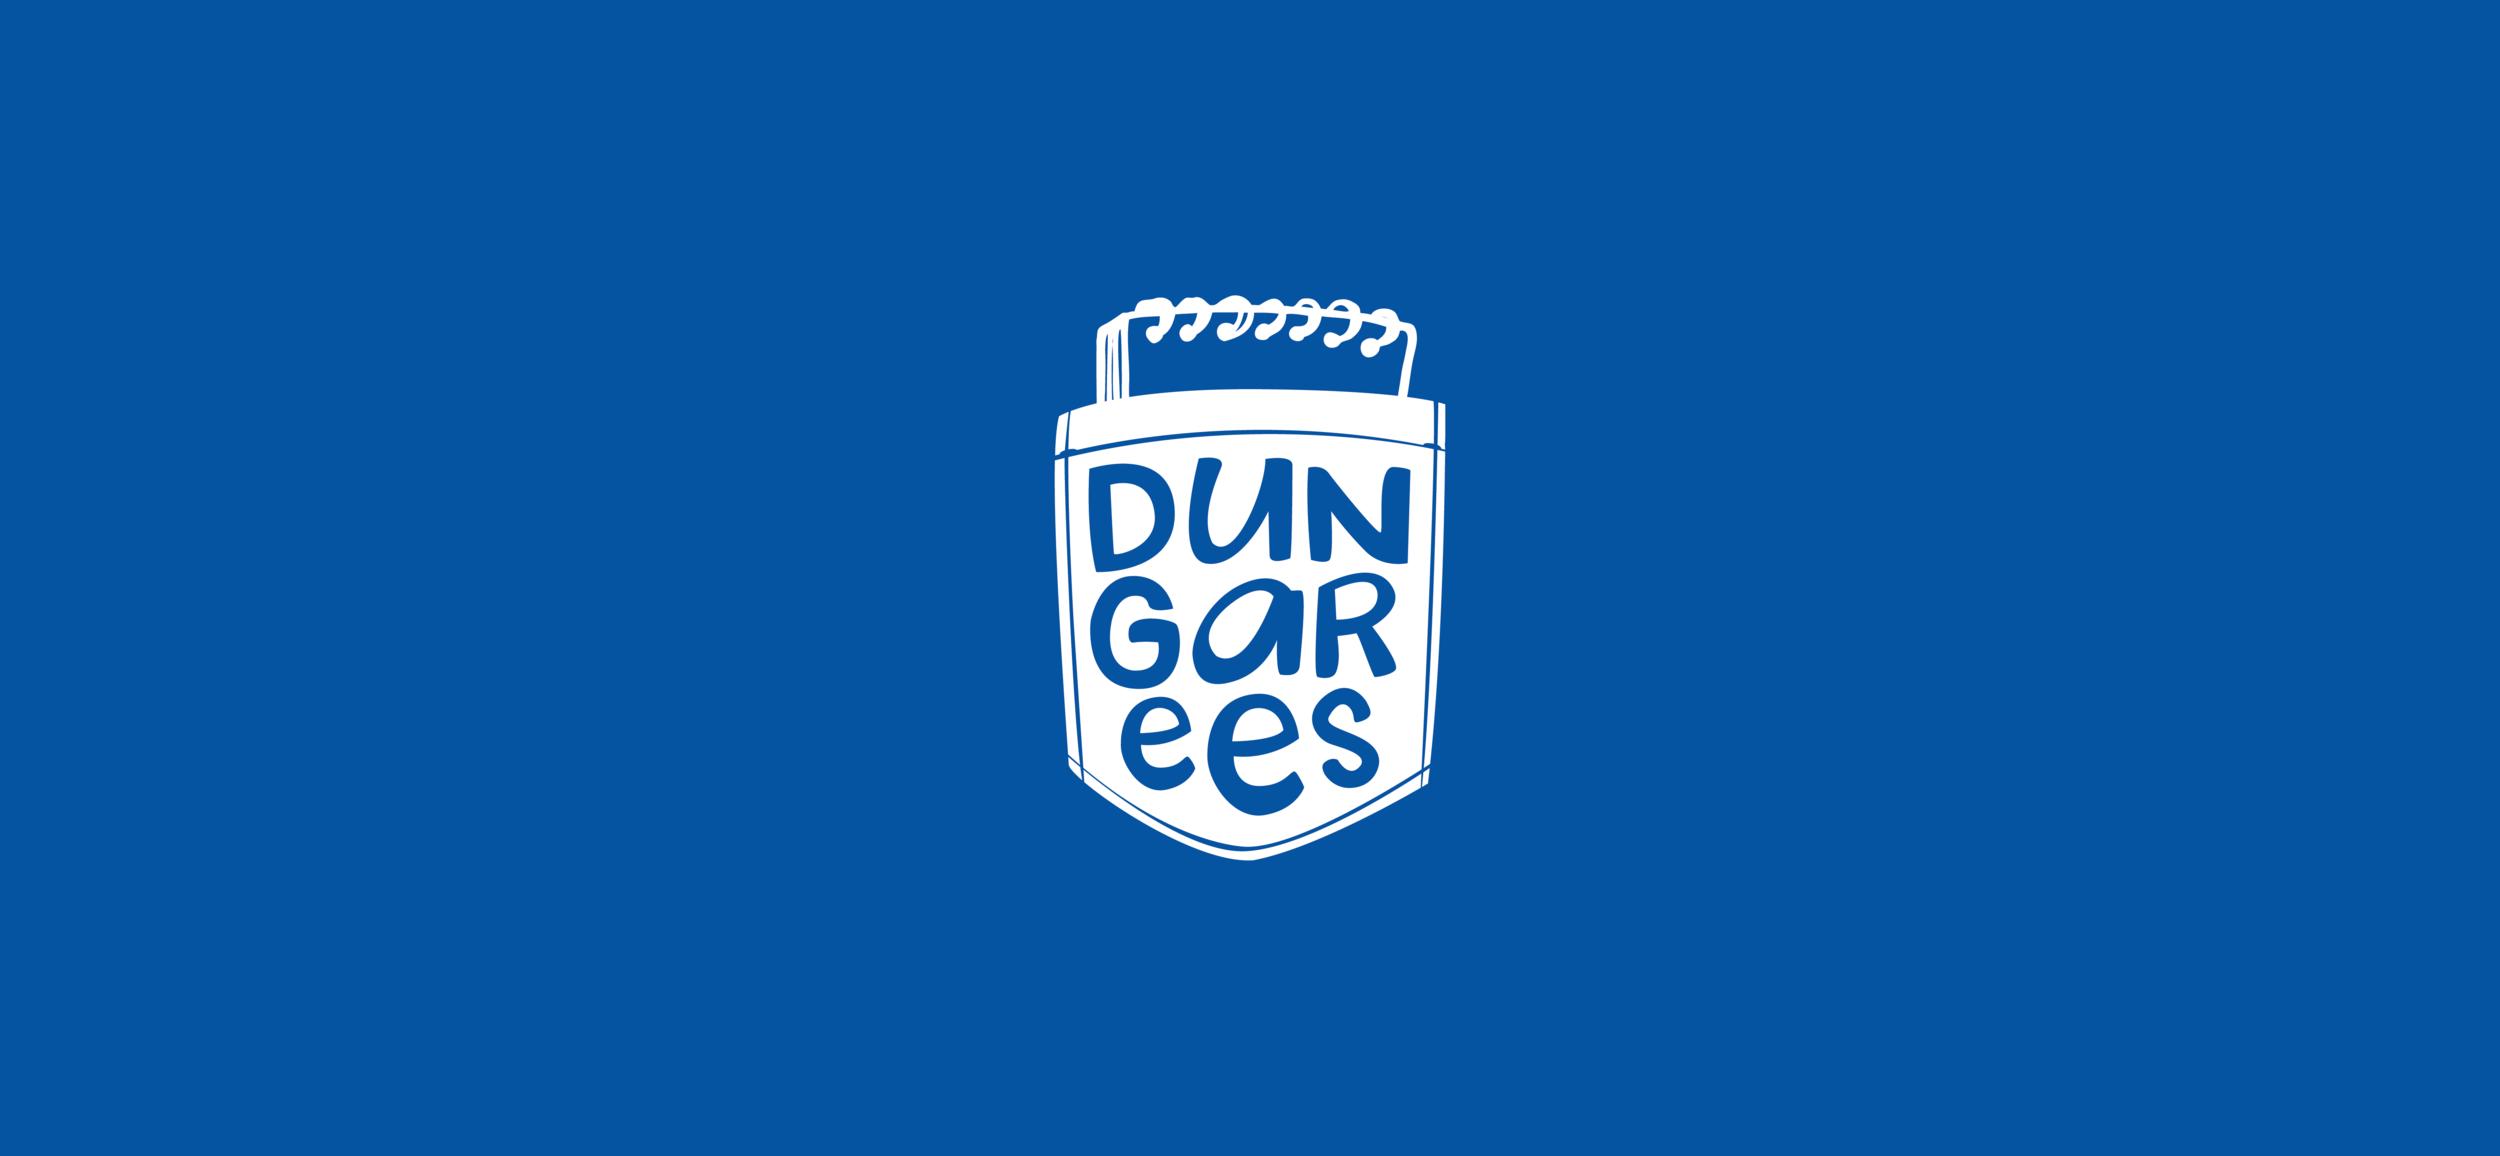 dungarees_logo-05.png